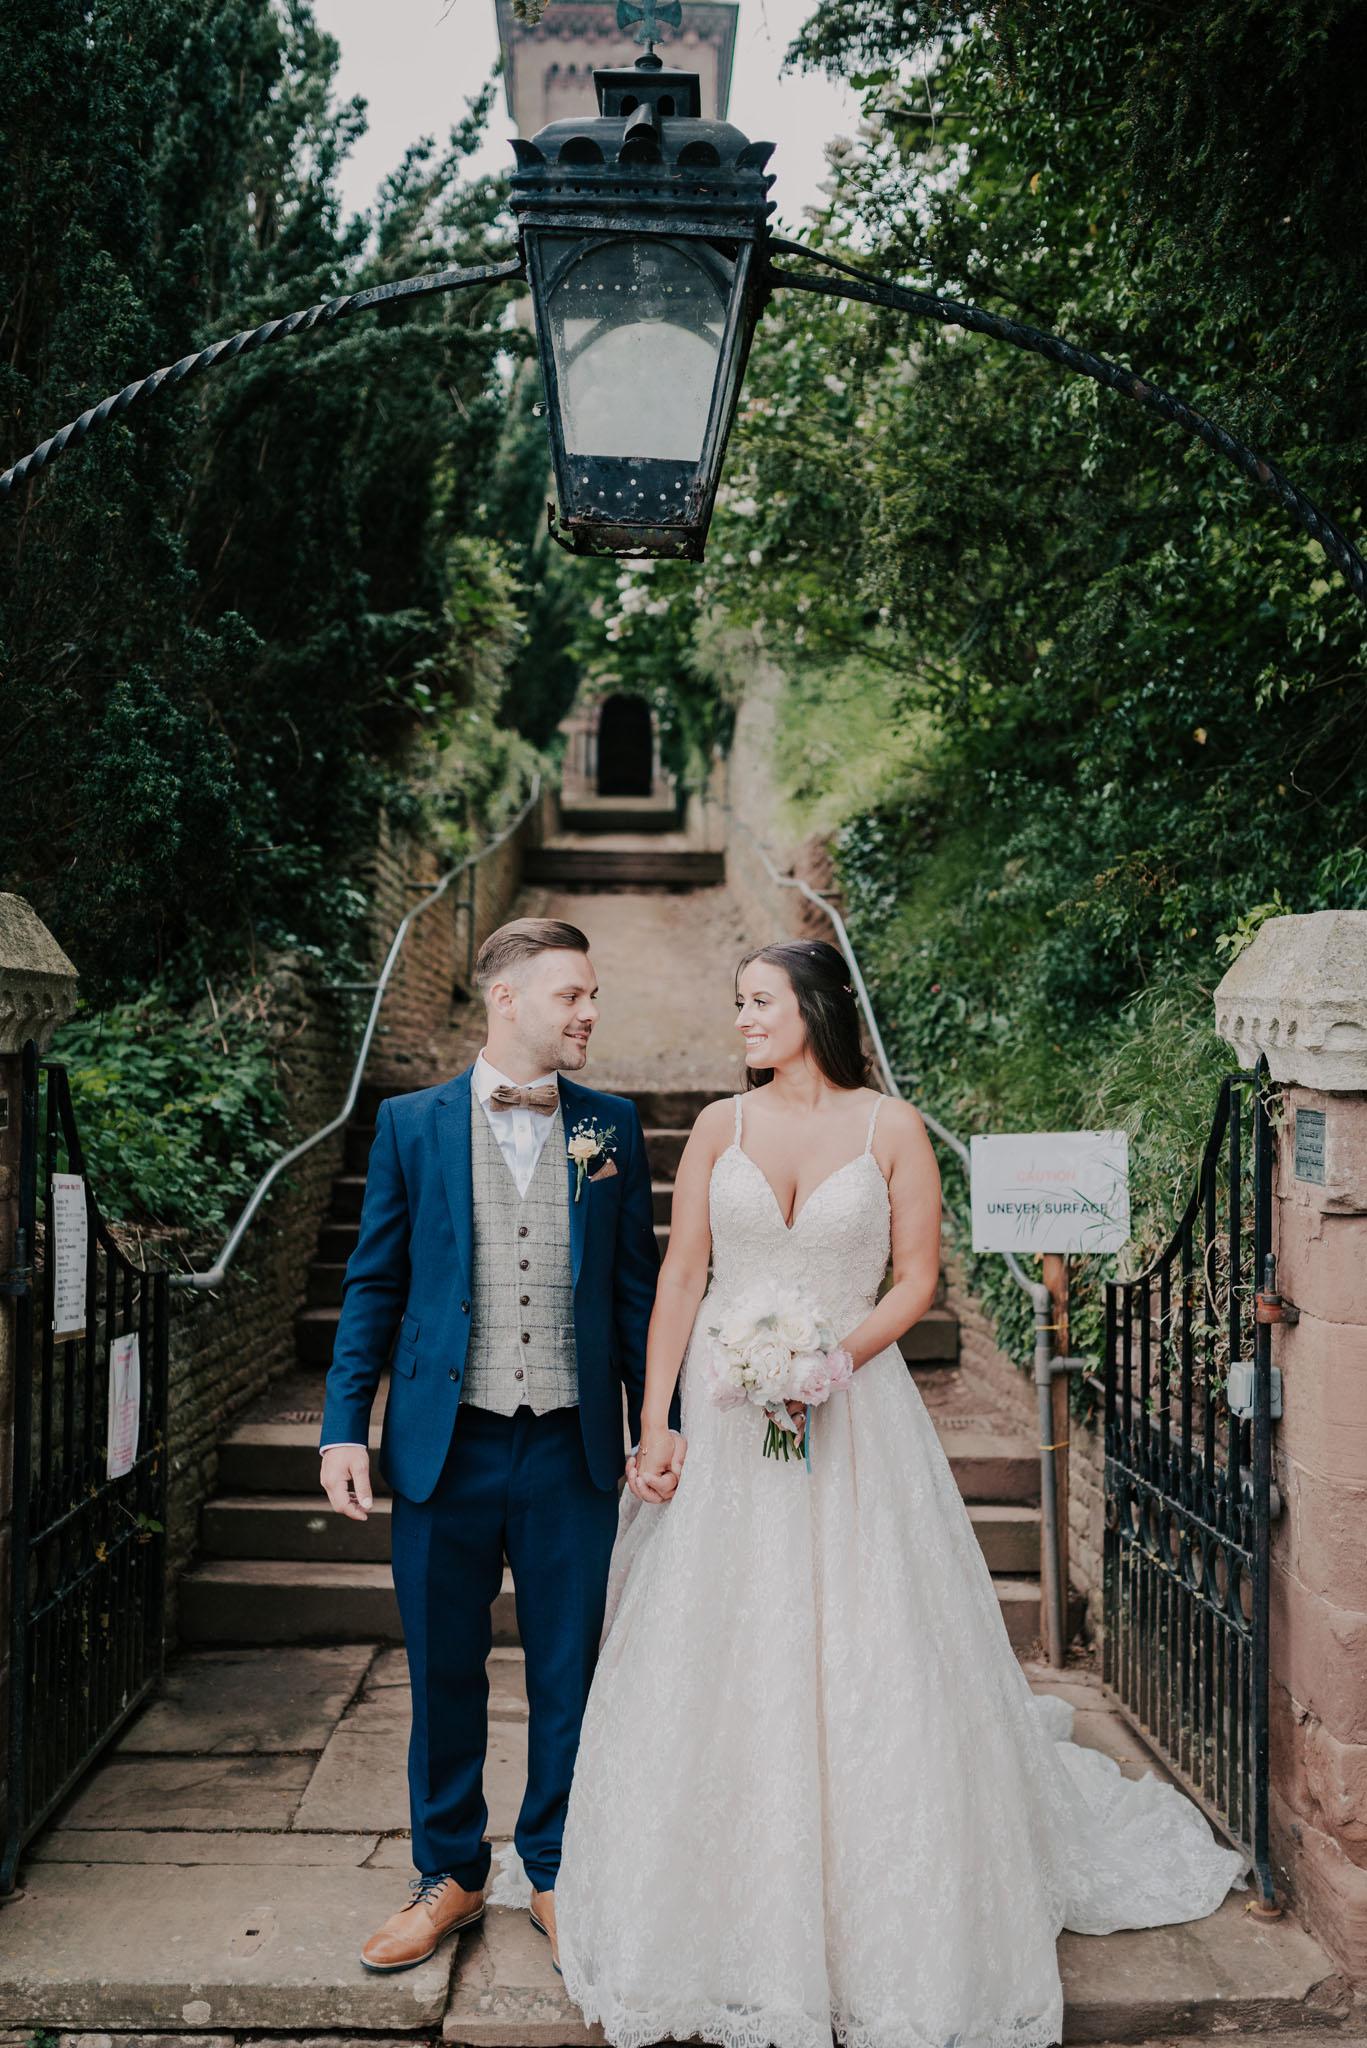 wedding-photographer-glewstone-court-hereford-scott-stockwell-photography307.jpg